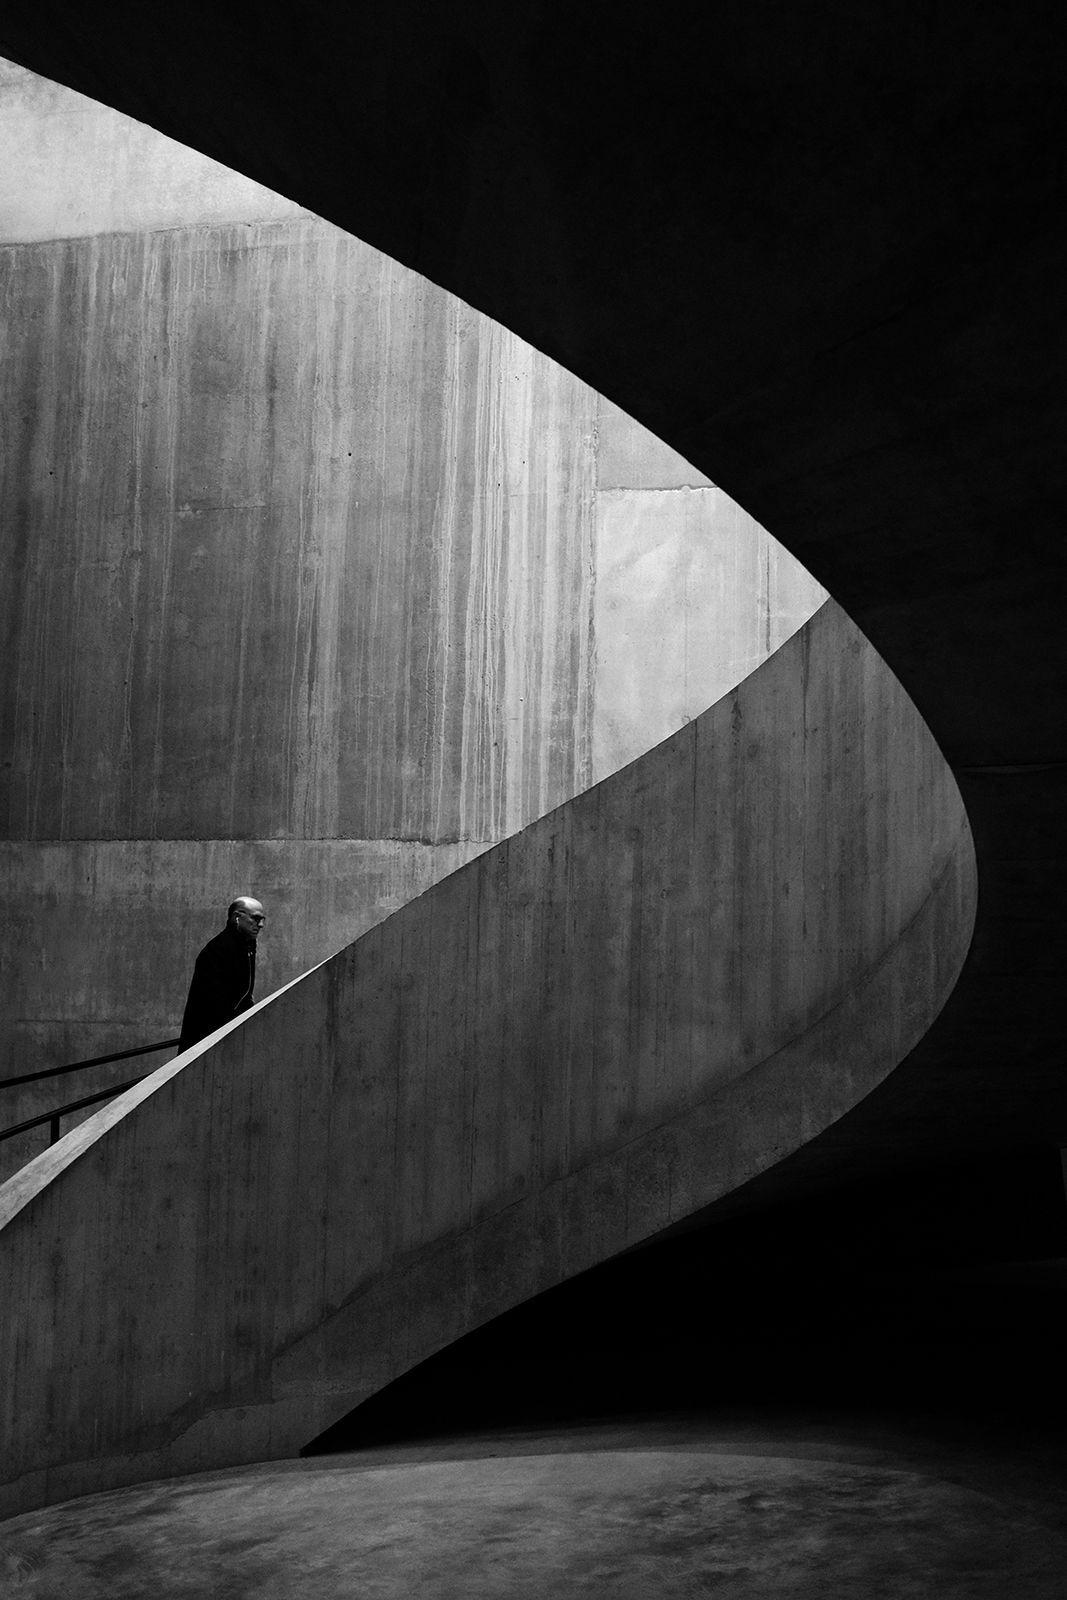 Petter Rustad | Black & White Photography Awards 2018 Entry